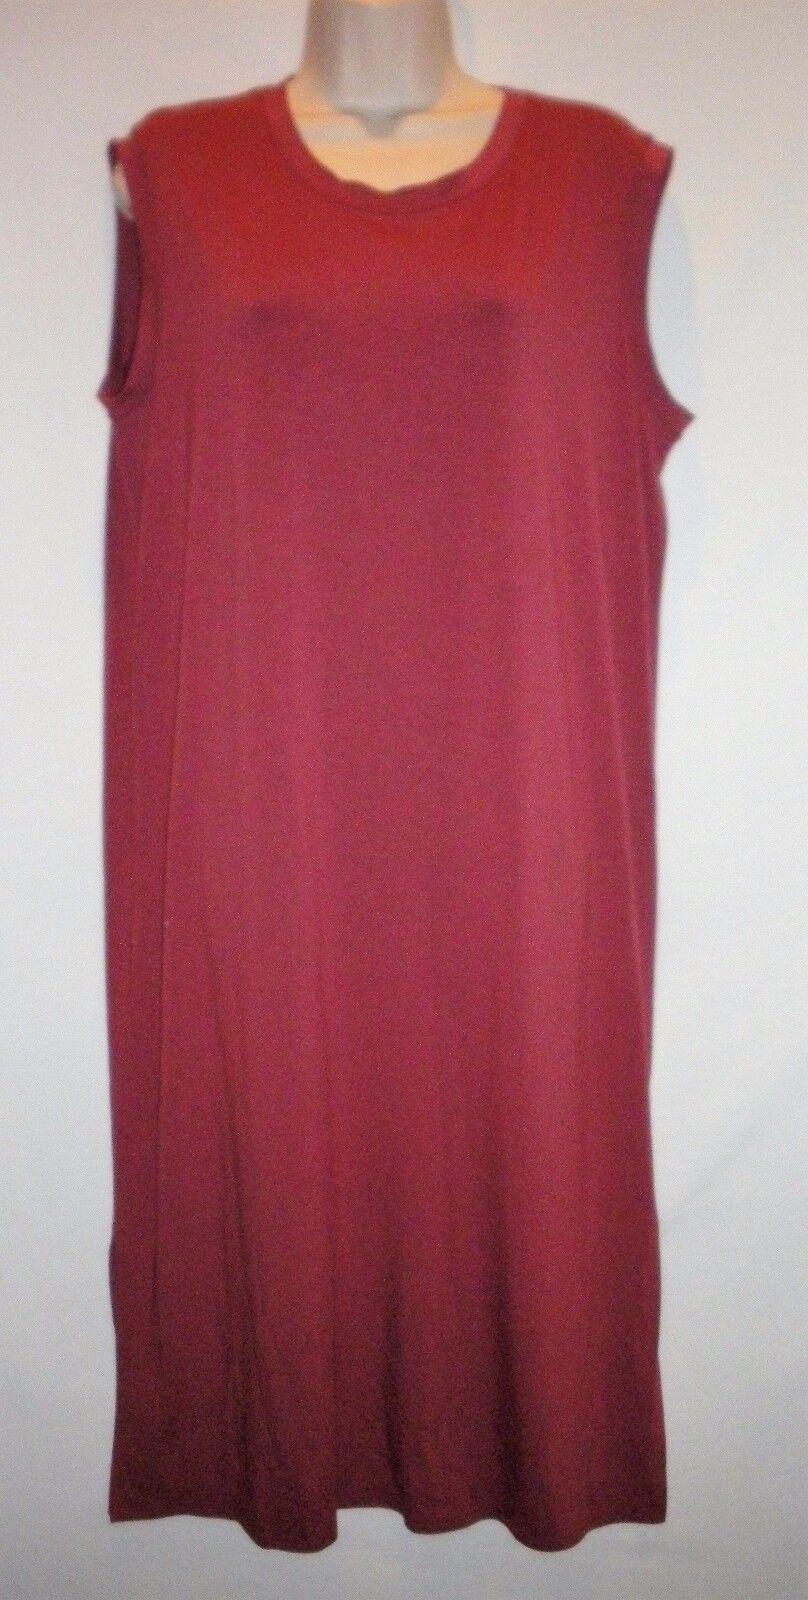 NWT  EILEEN FISHER Jersey Dress Plus Size 2X 2X 2X MSRP  218 pinkwood 7ed8d9